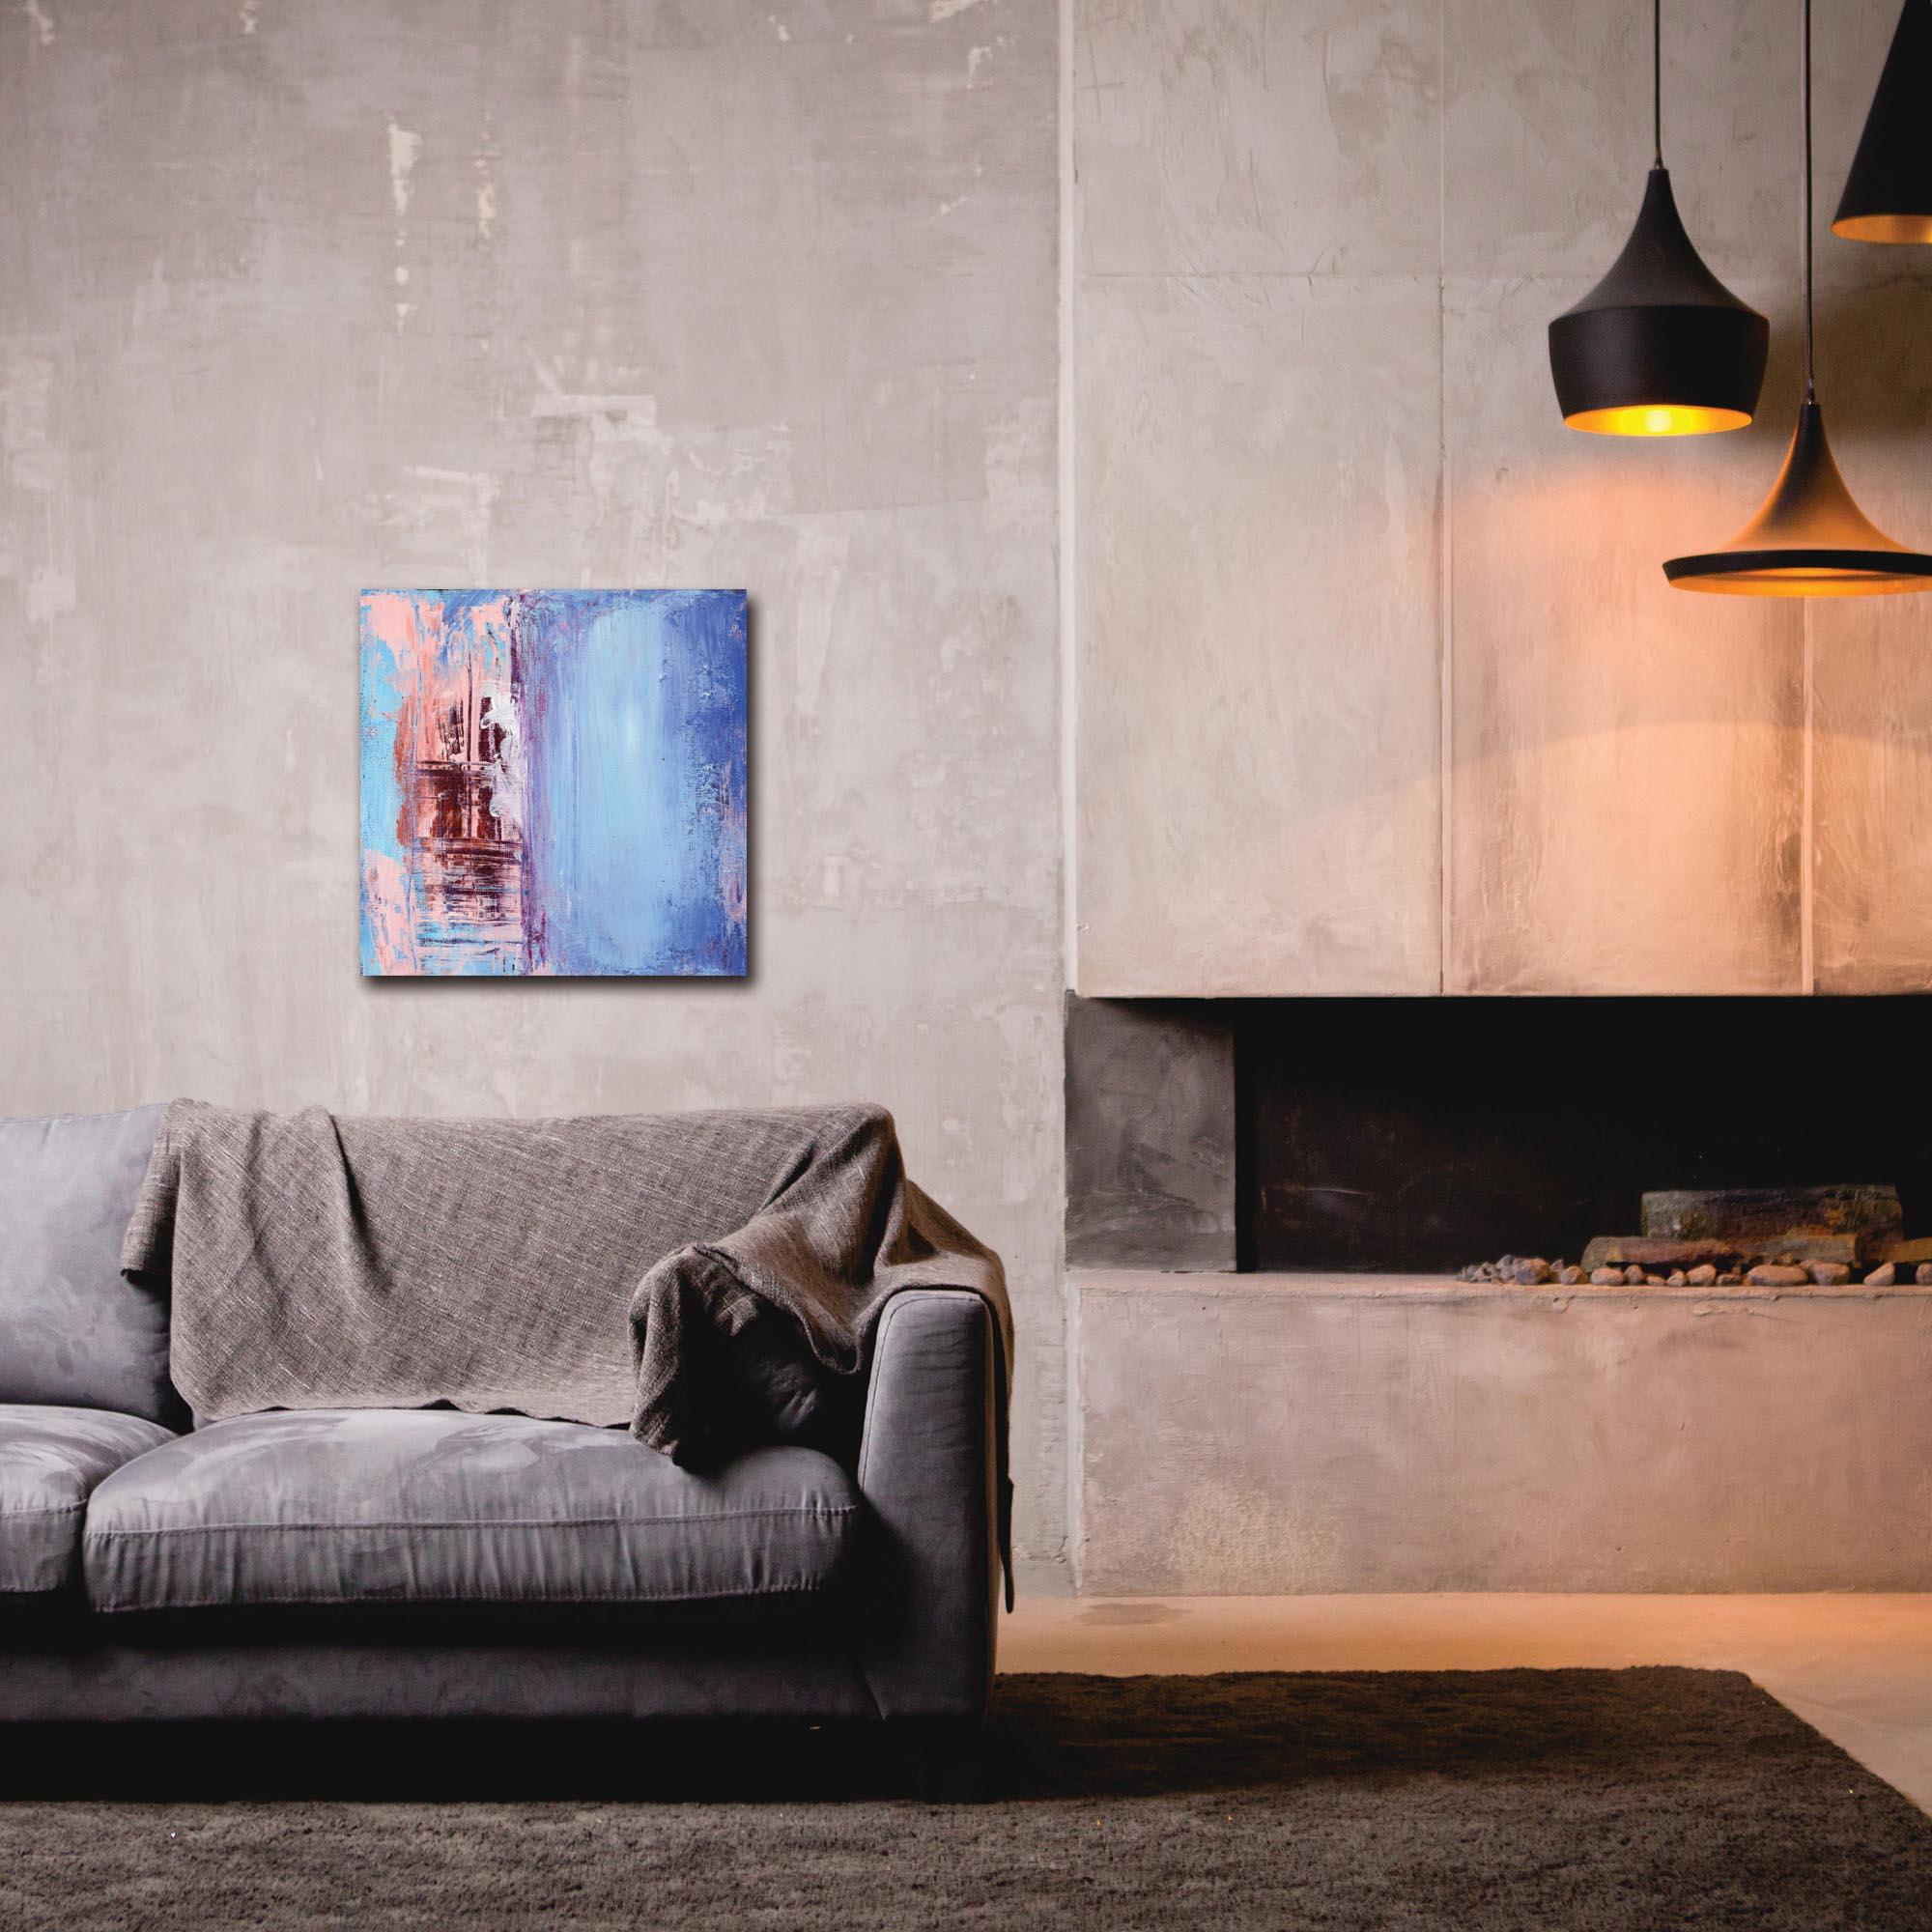 Abstract Wall Art 'Urban Life 2' - Urban Decor on Metal or Plexiglass - Lifestyle View